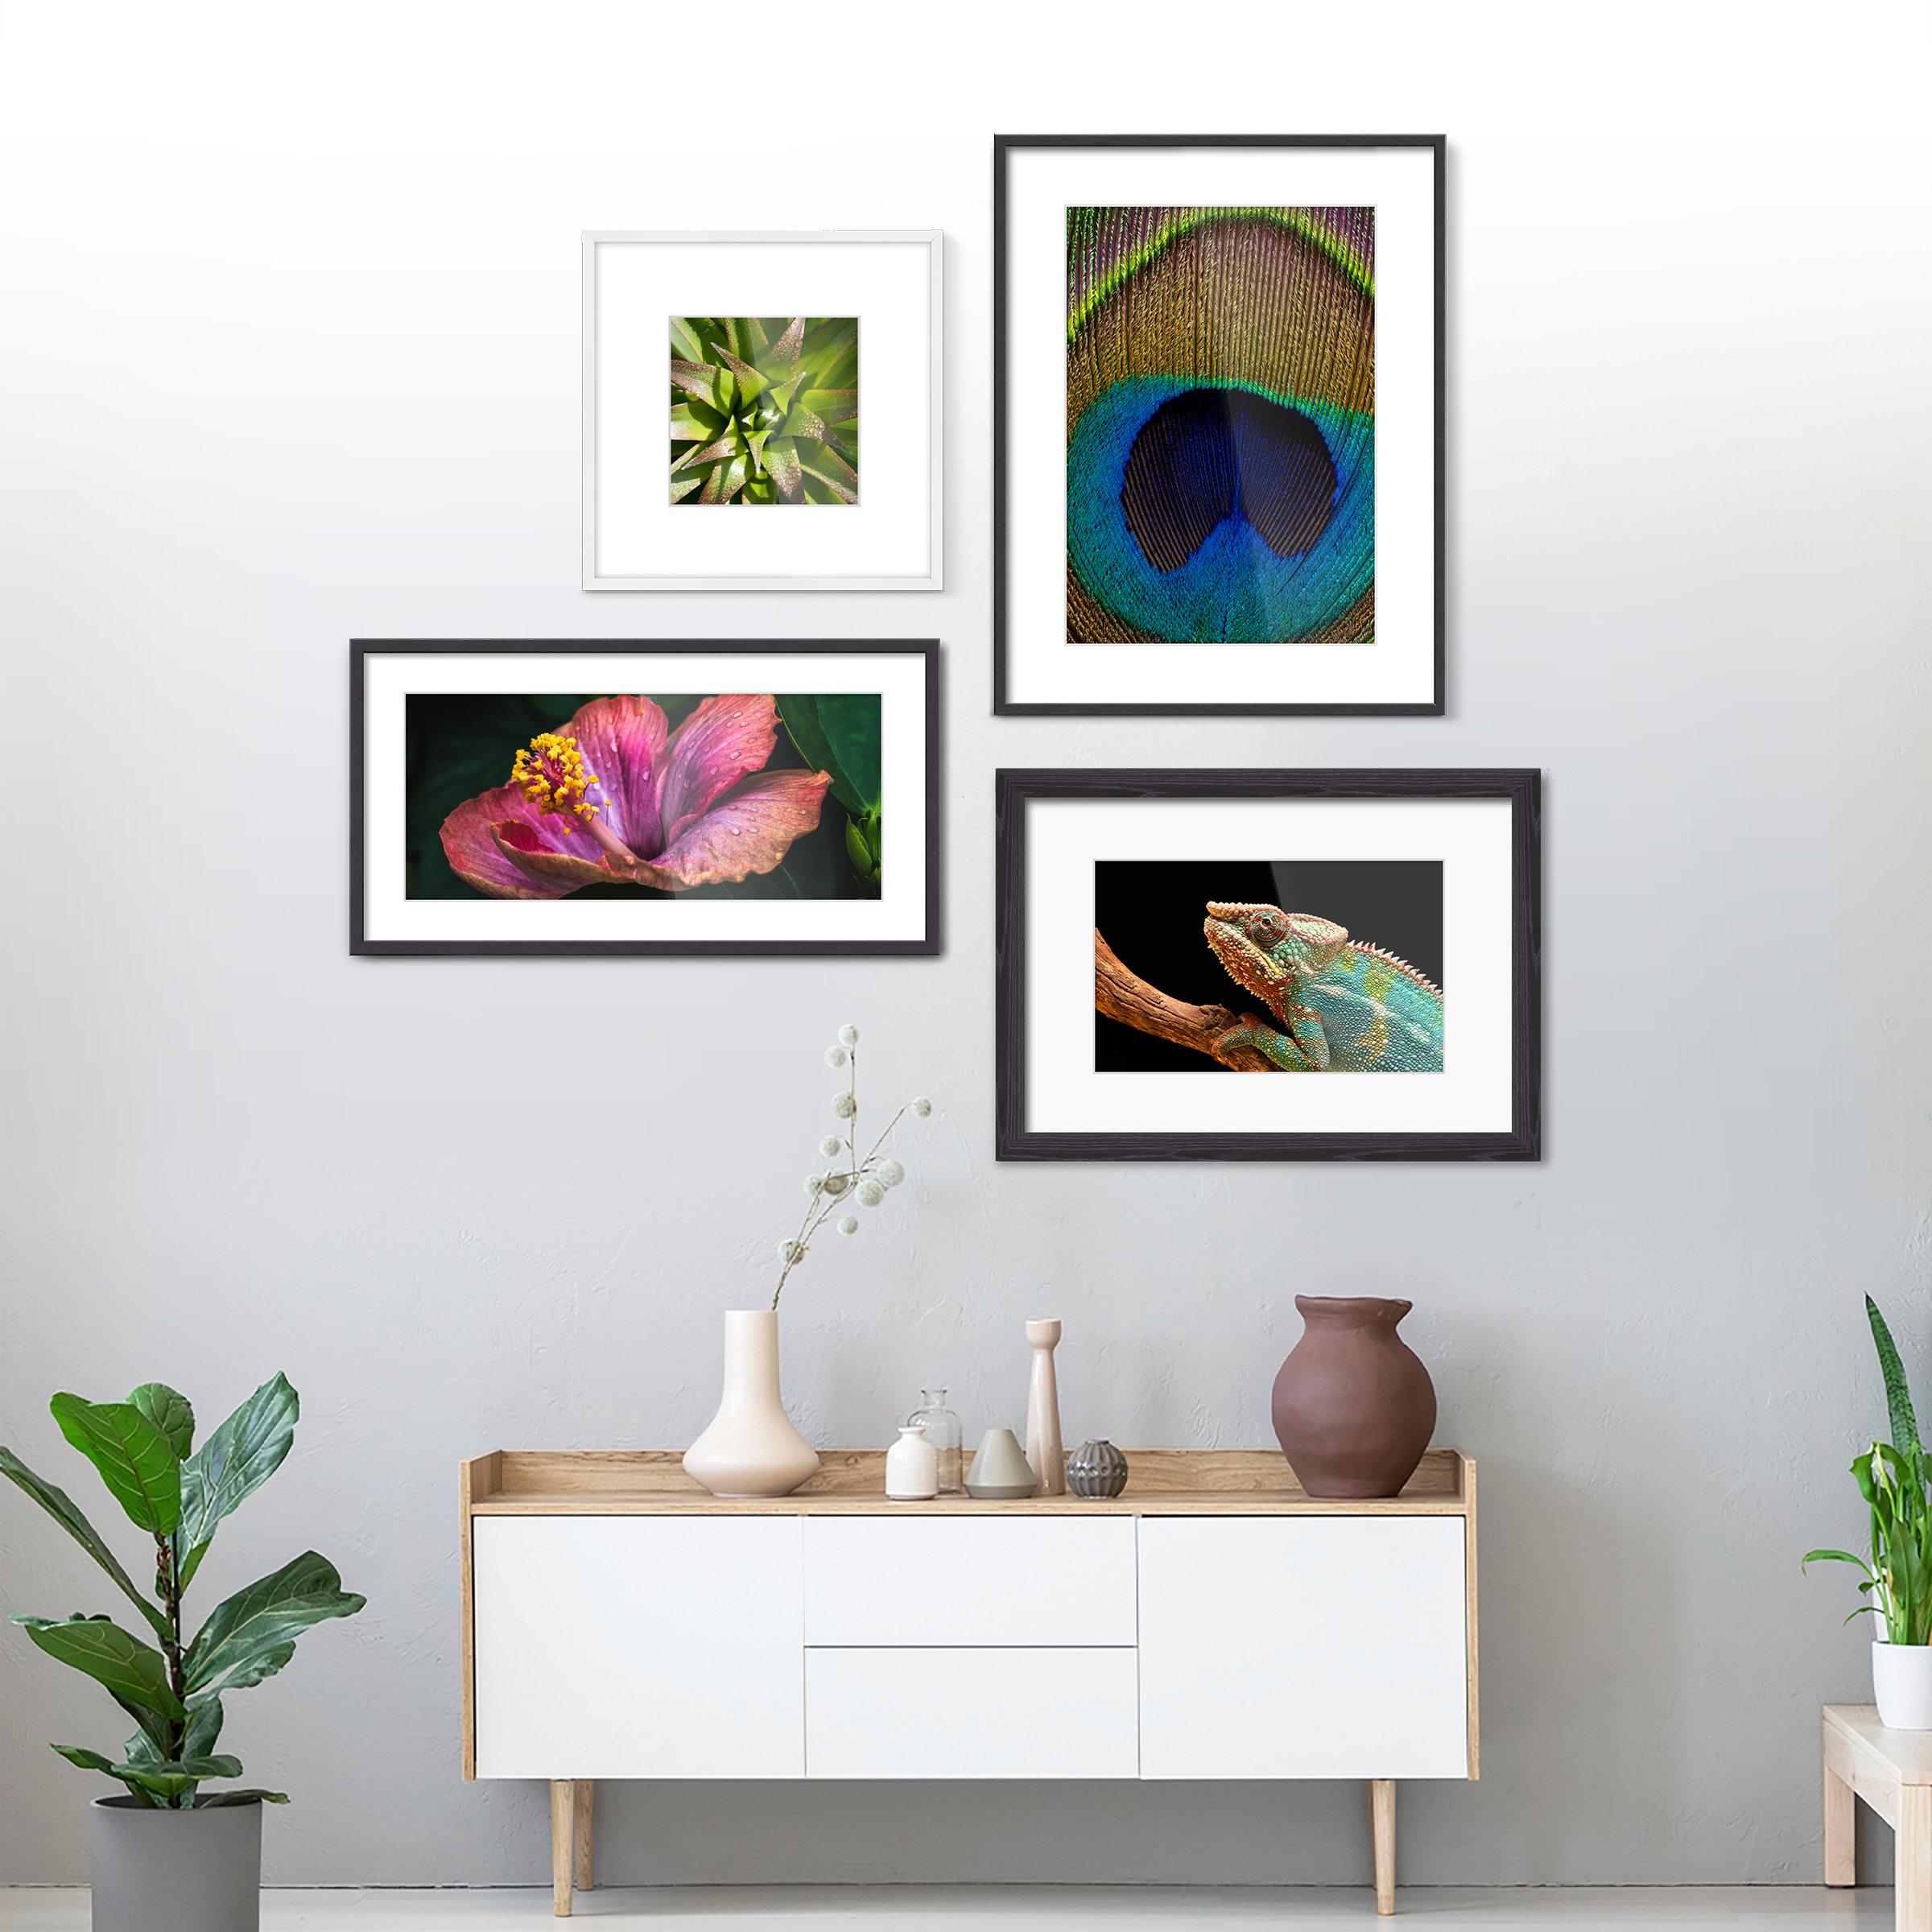 ultra-hd-fotoabzug-tiere-inspiration-1200x1200.jpg